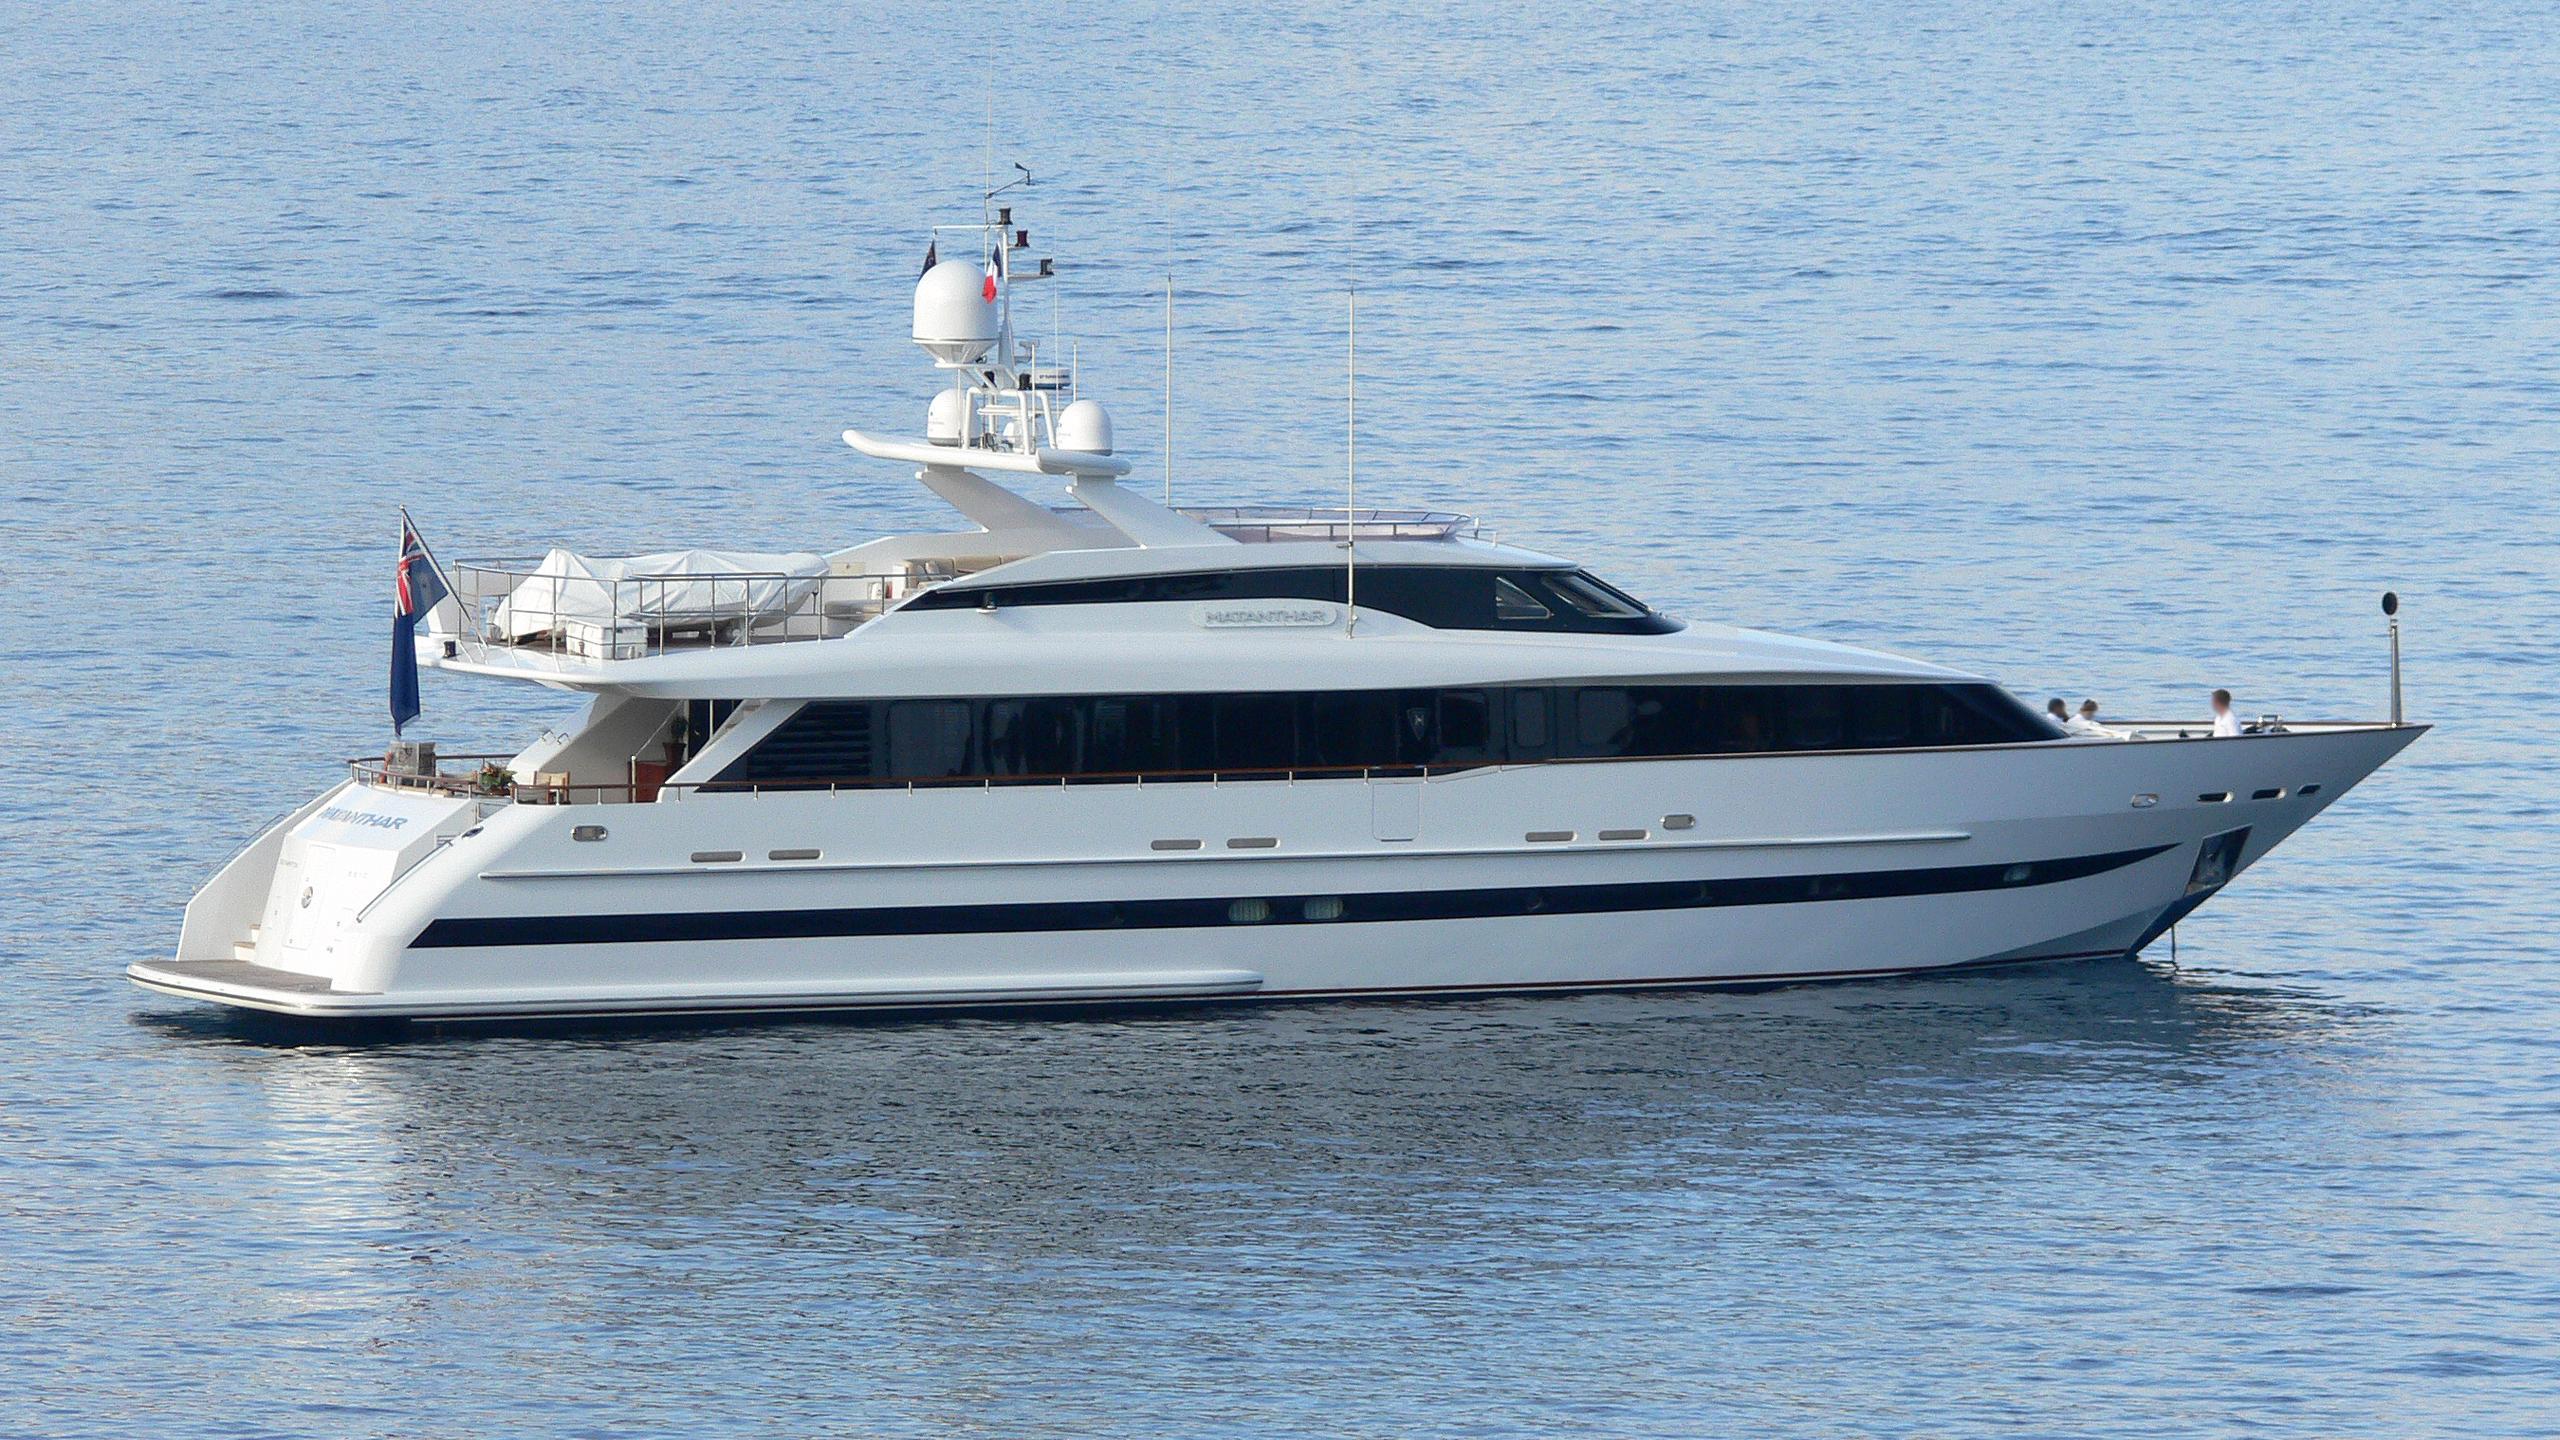 zabava-pokrov-ii-matanthar-motor-yacht-heesen-2000-31m-profile